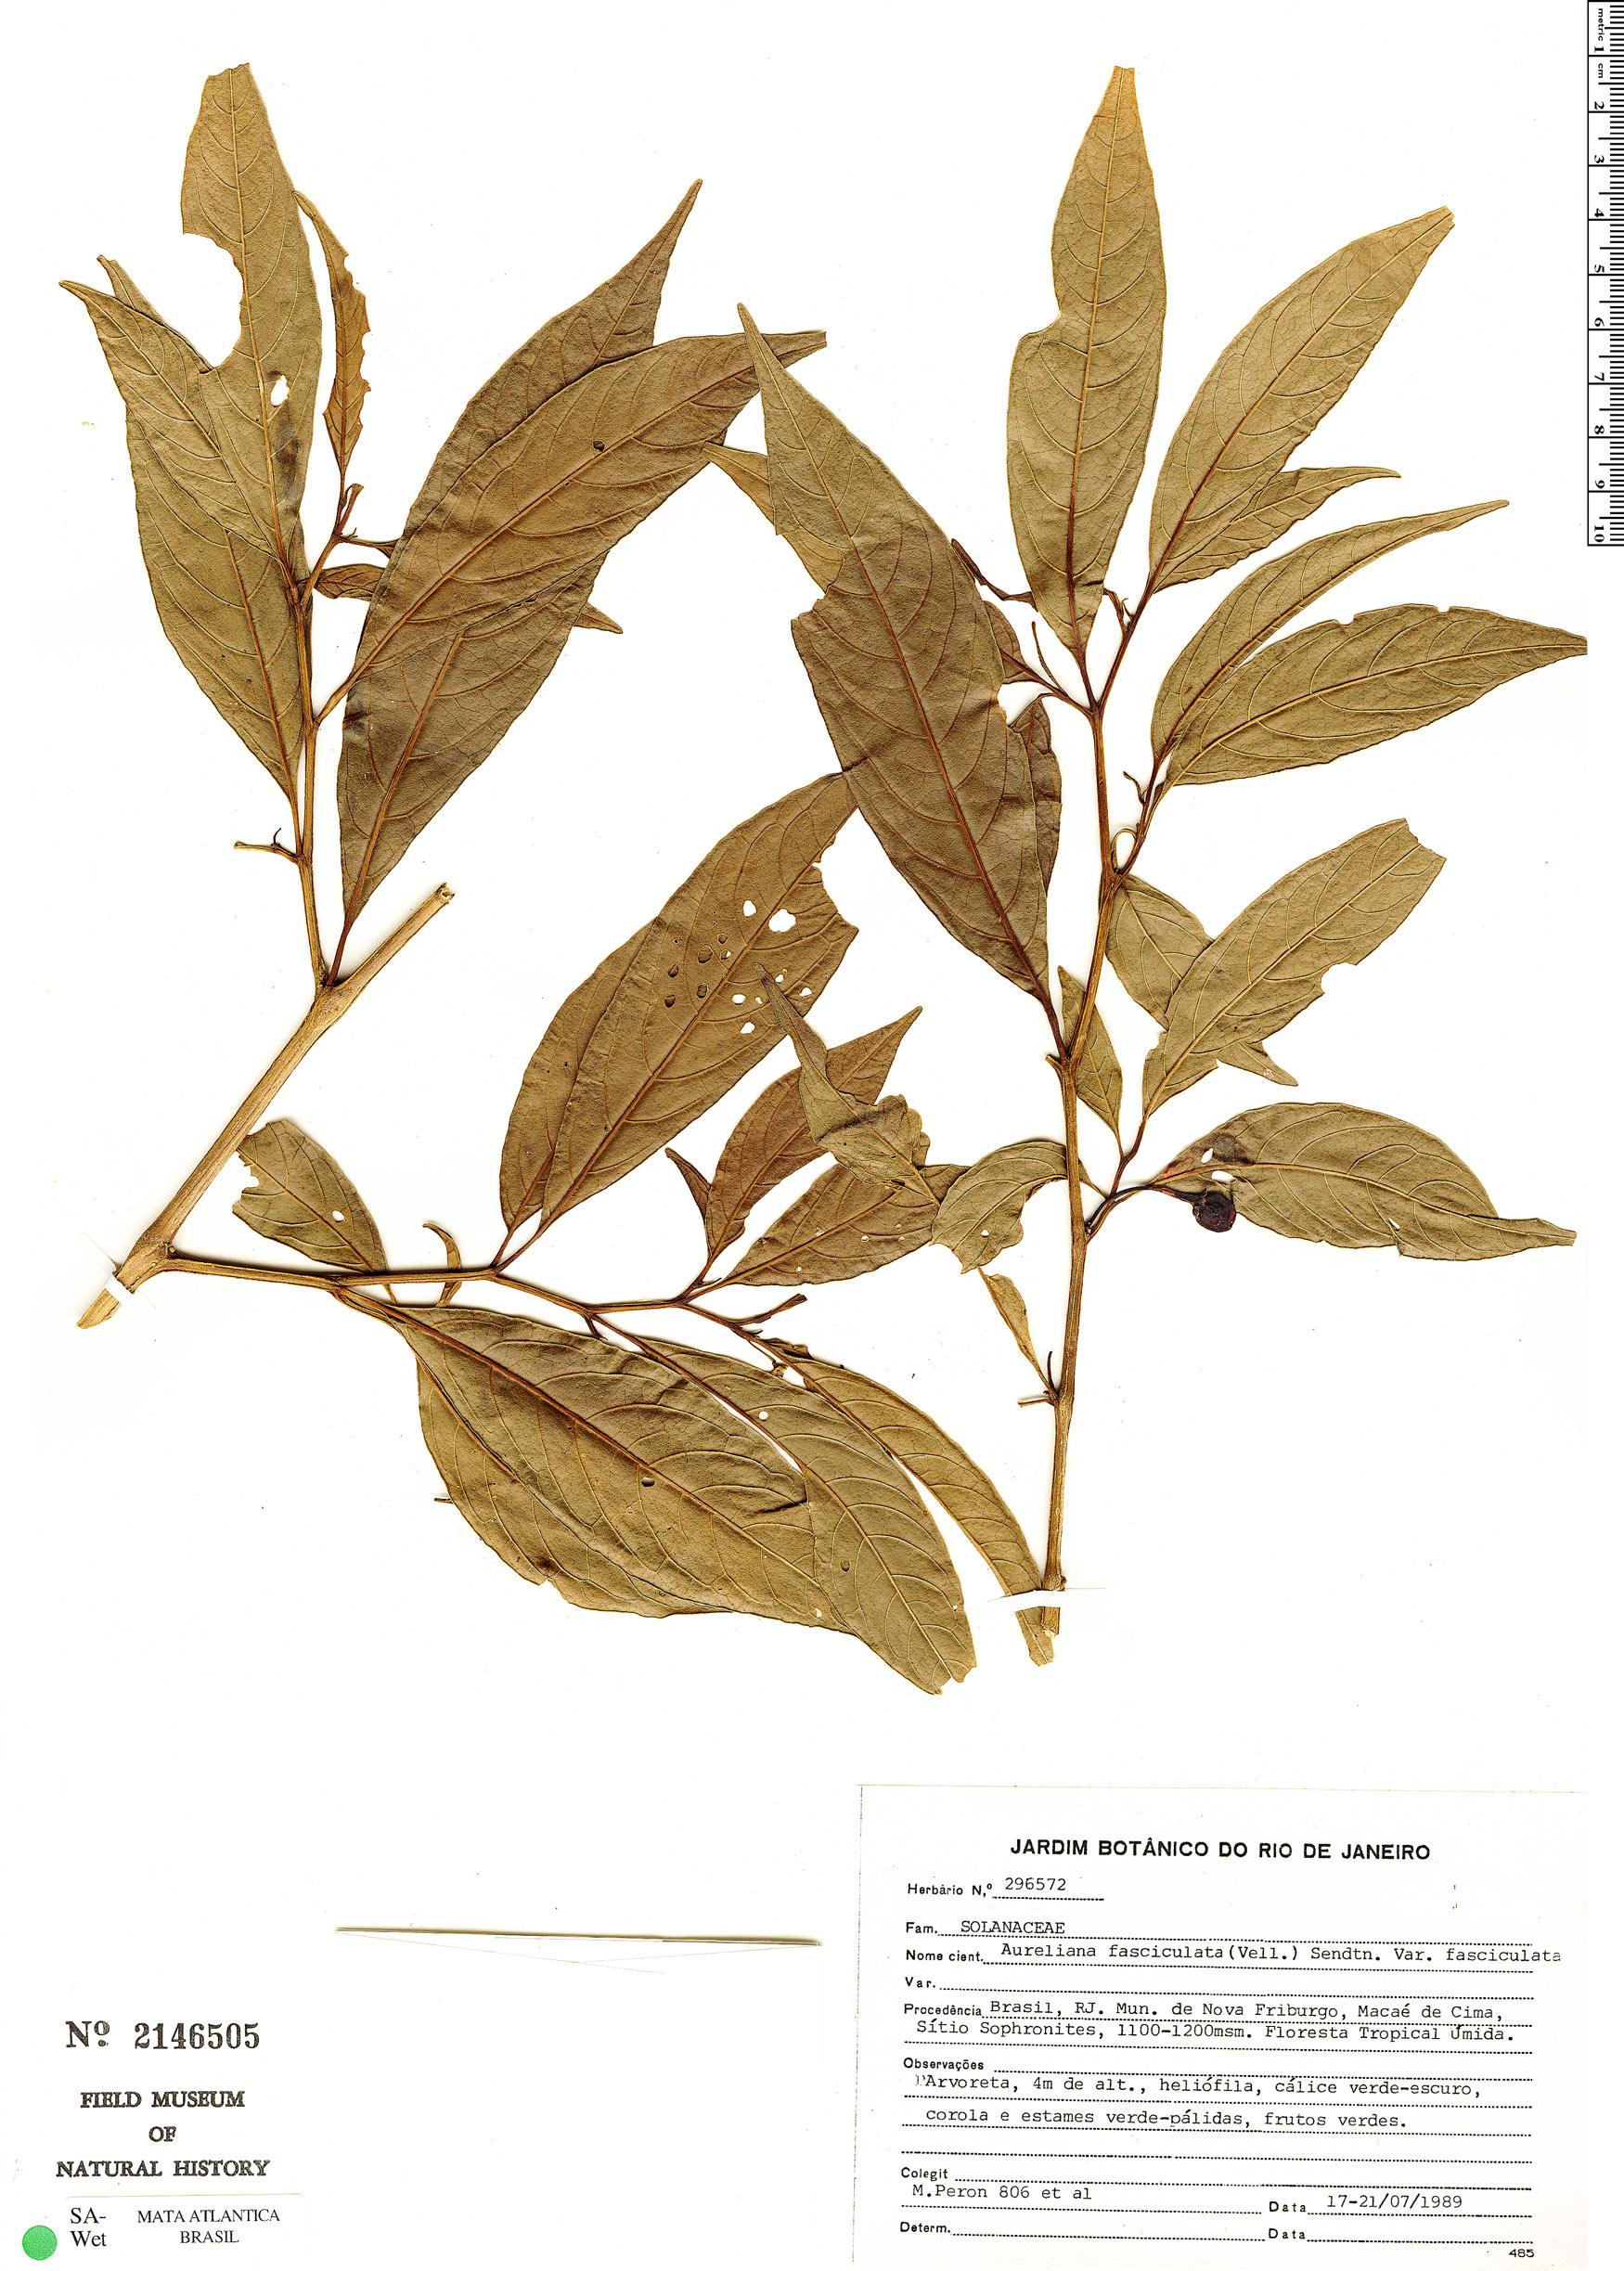 Espécime: Aureliana fasciculata